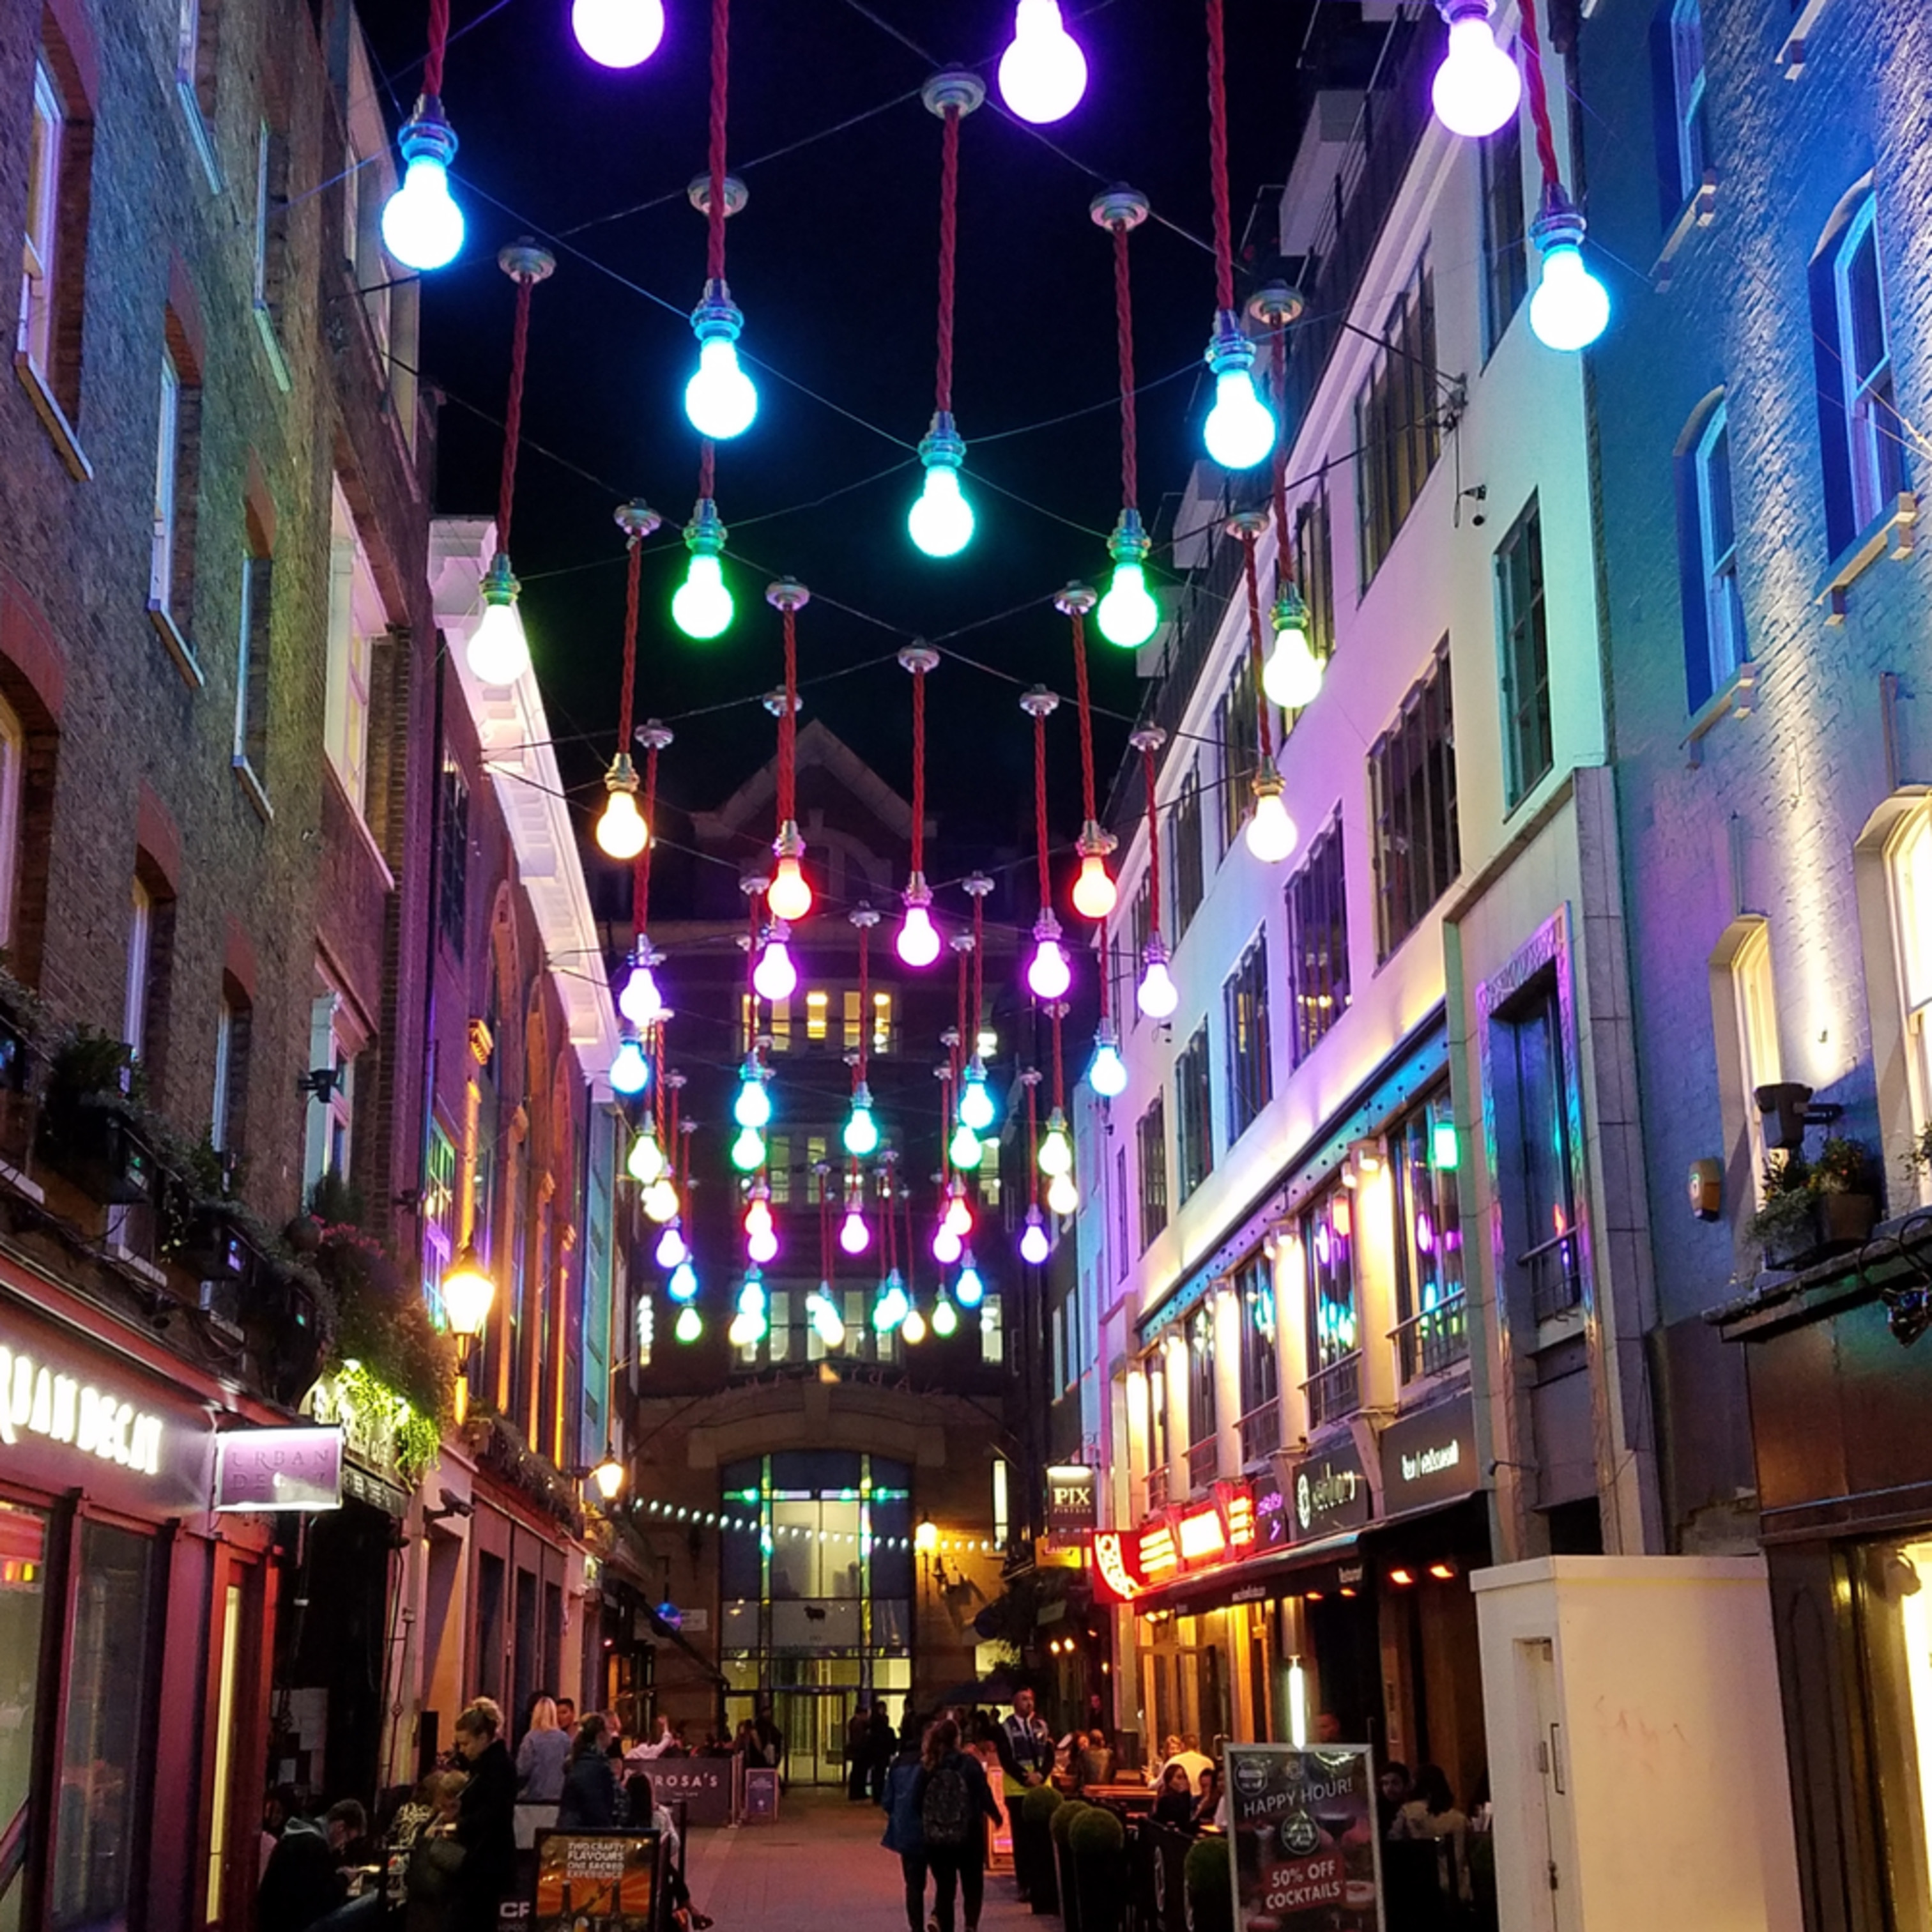 Under the lights at carnaby street zplibh